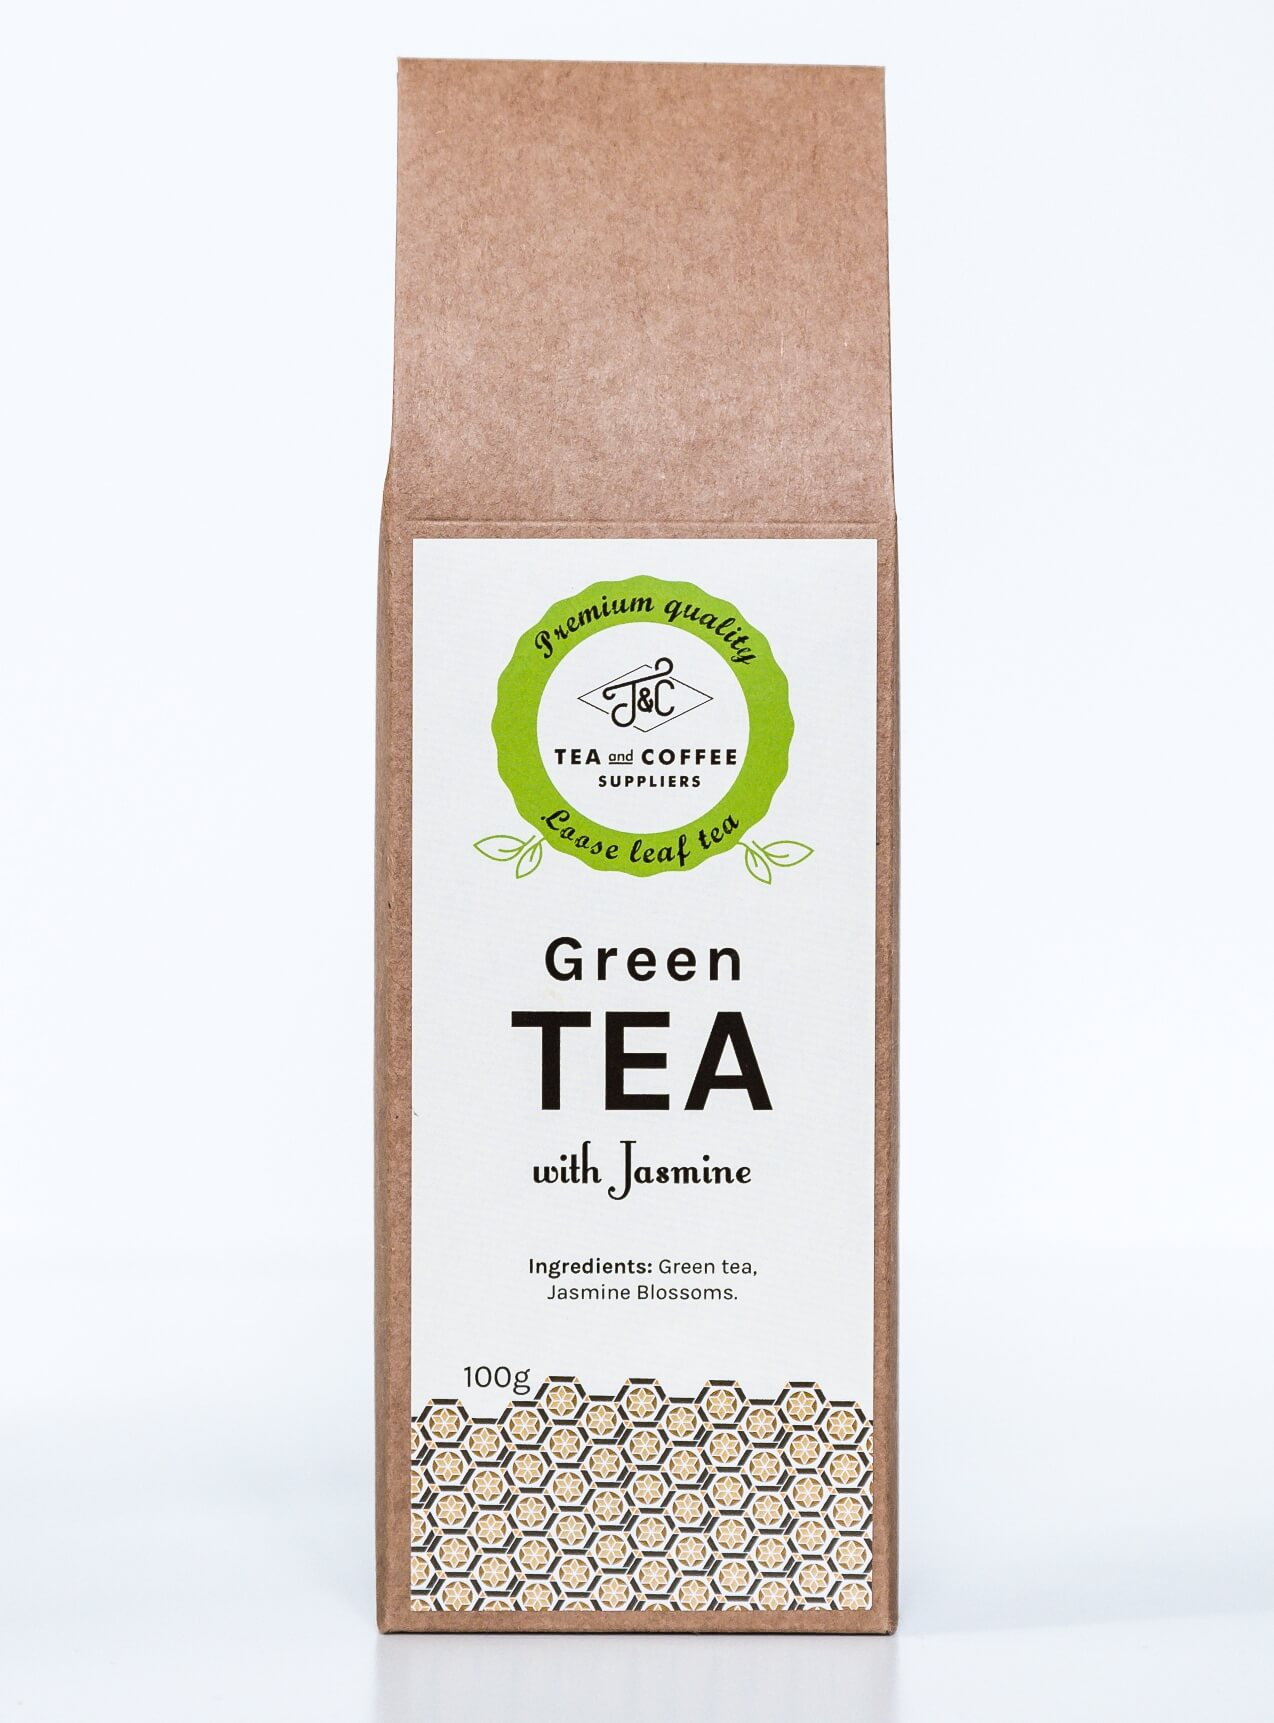 T&C Green Tea with Jasmine